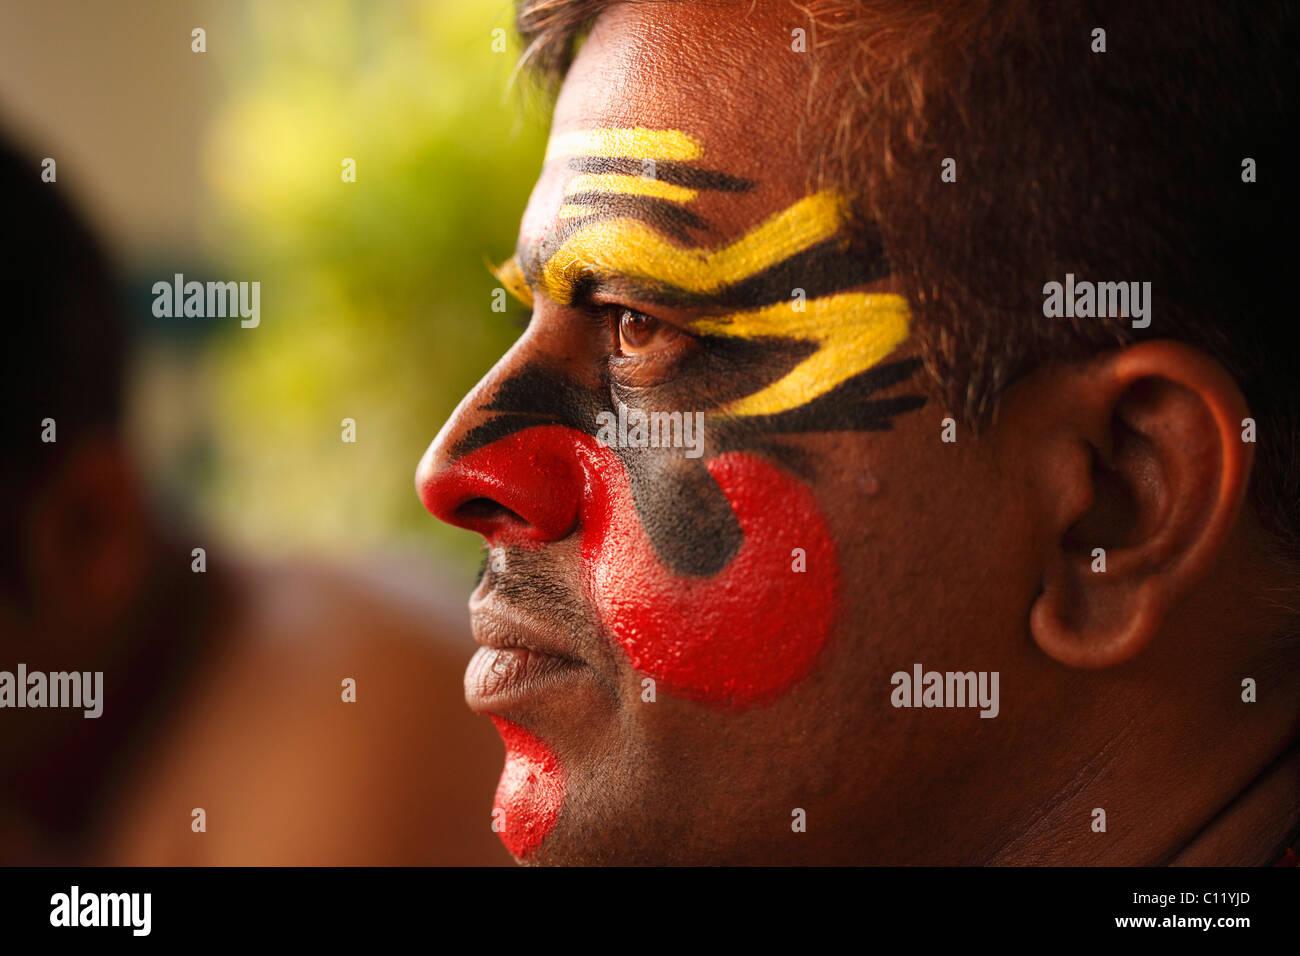 Kathakali dancer with half-finished make up, Chuvanna Thaadi mask, Kerala, southern India, Asia - Stock Image